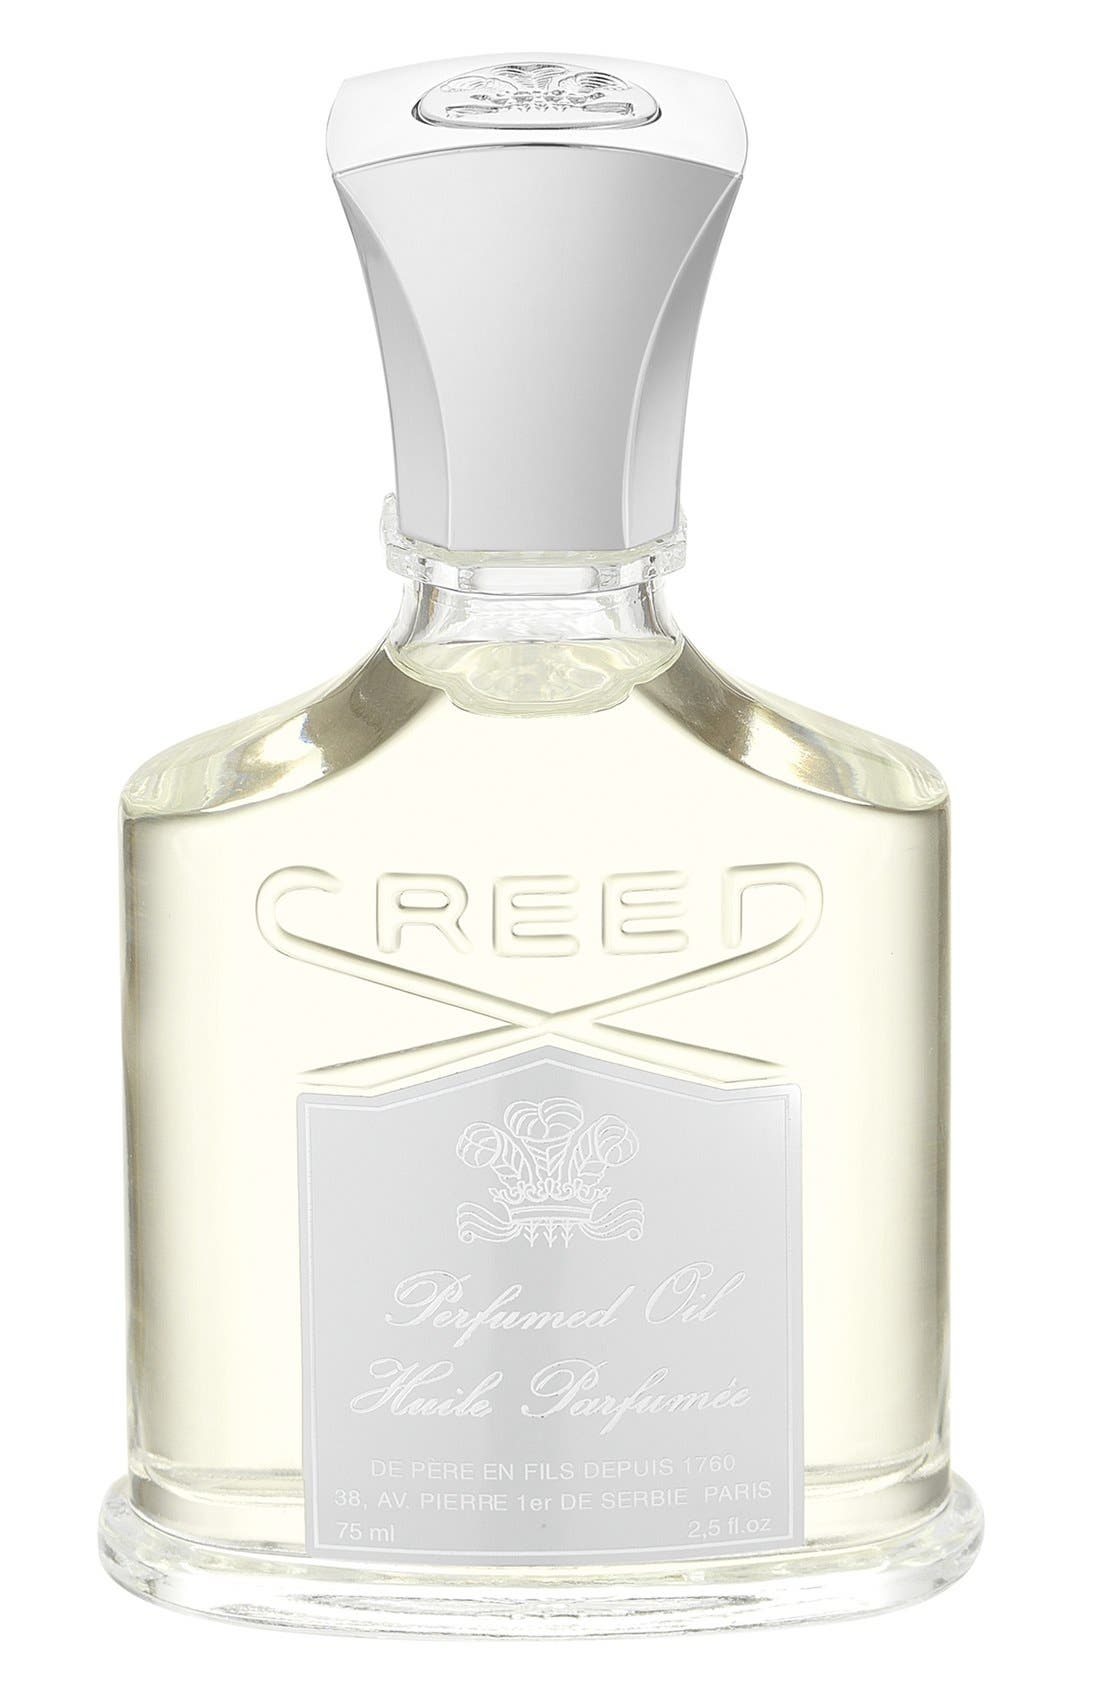 Creed 'Love in White' Perfume Oil Spray